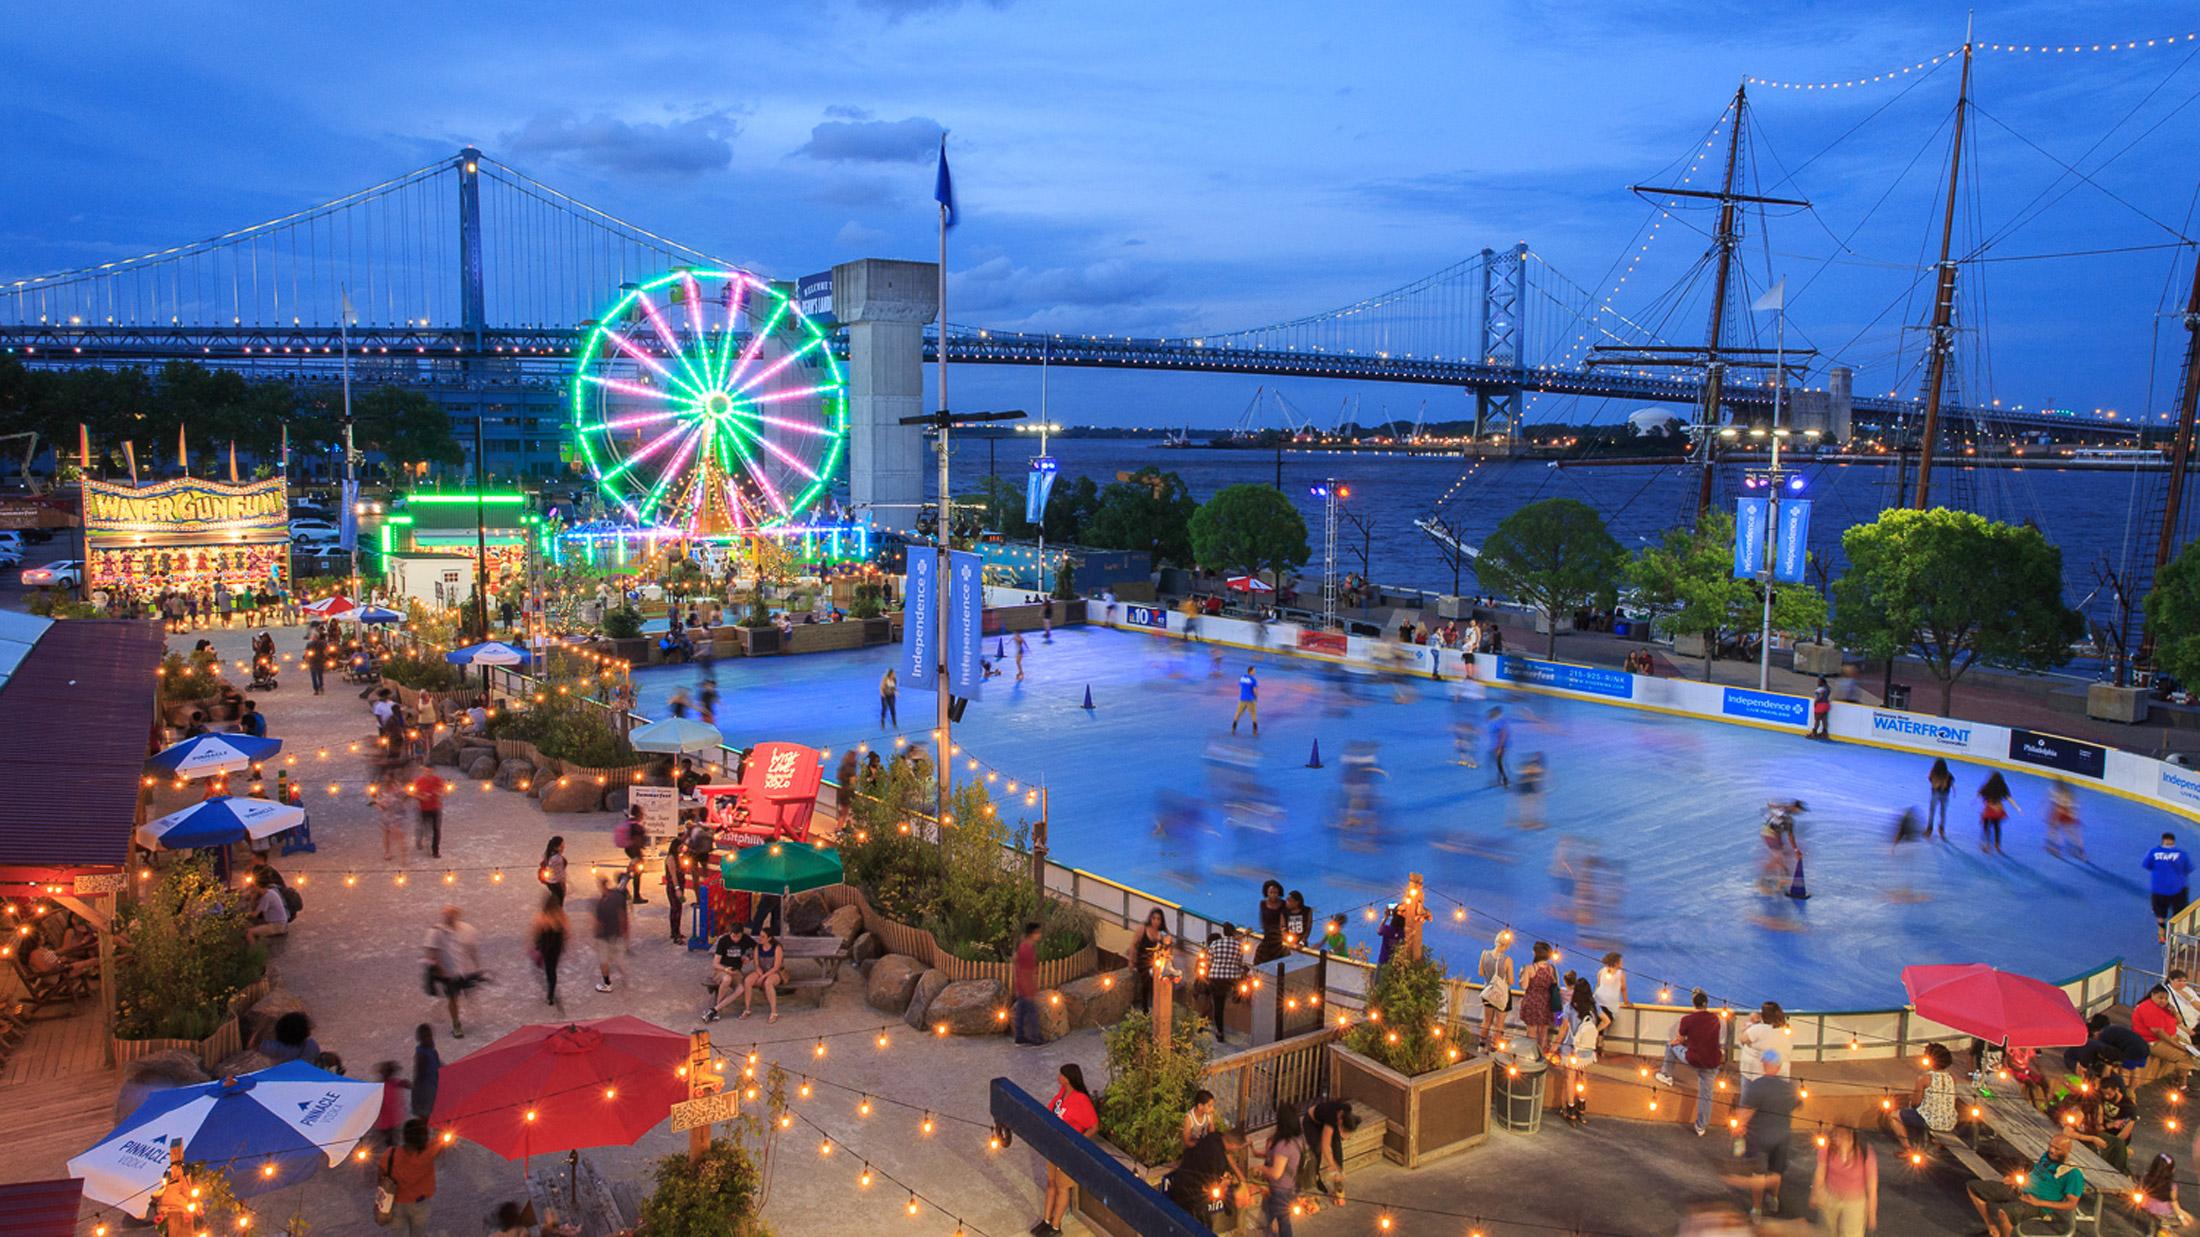 Blue Cross Riverrink Summerfest And The Midway Visit Philadelphia